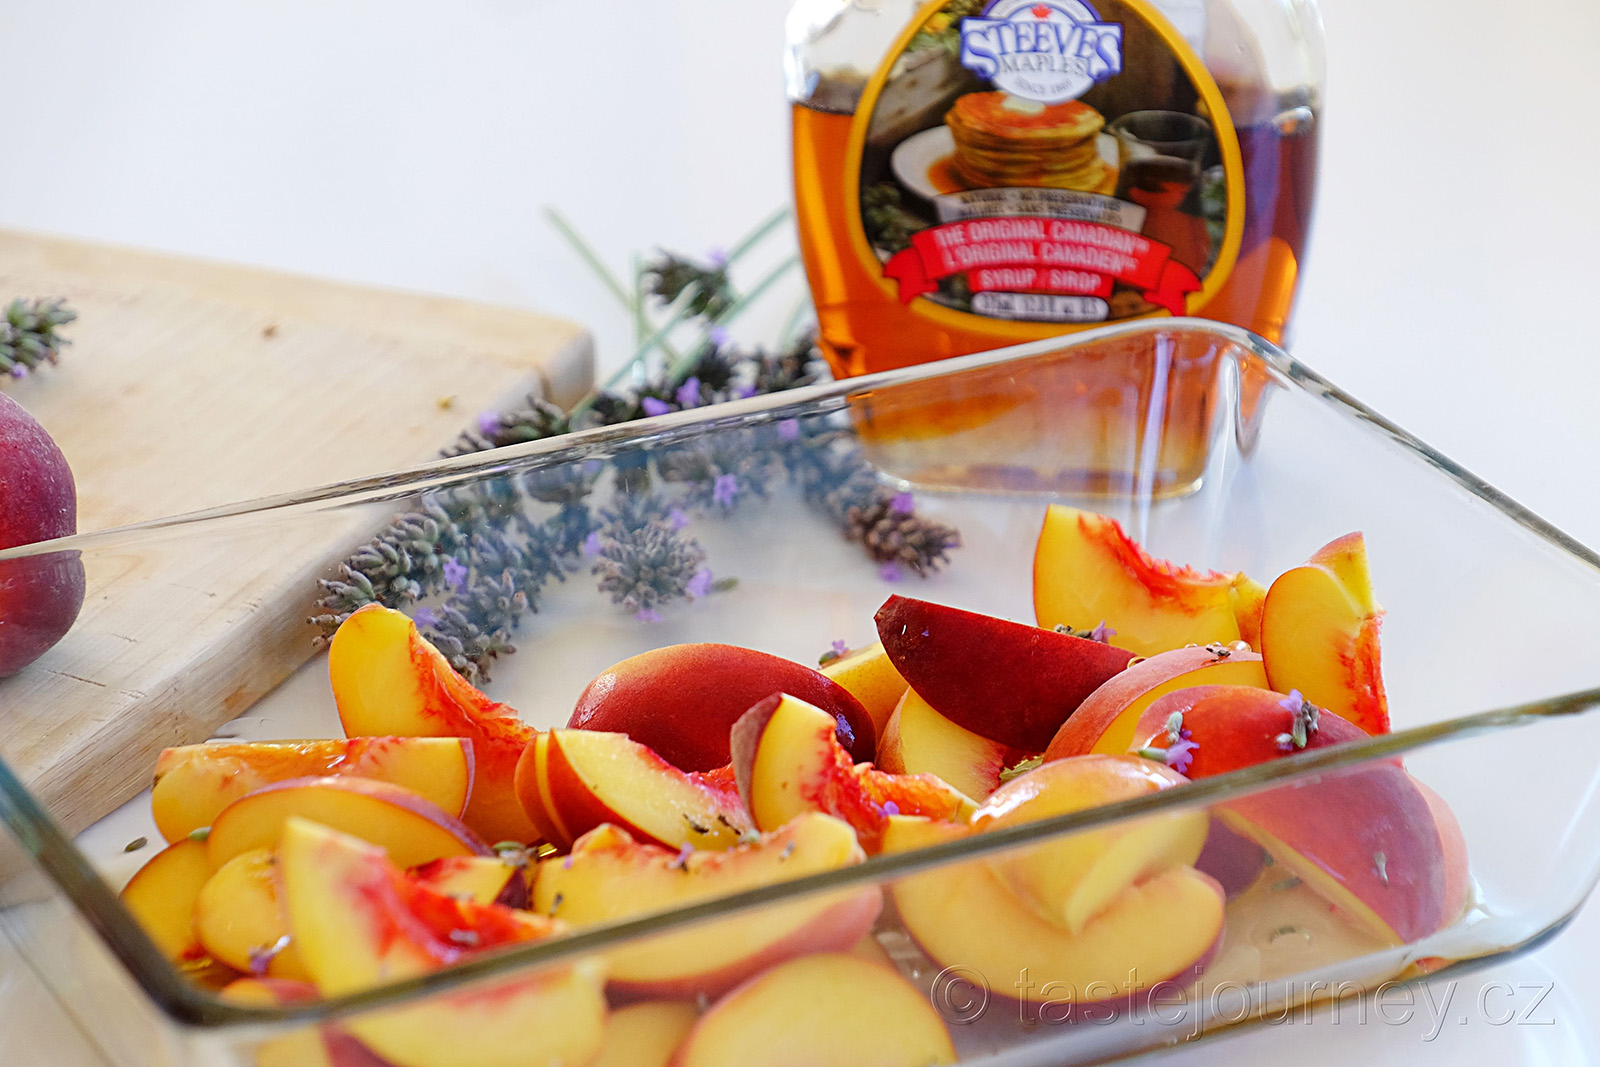 Macerujte levandule i broskve v javorovém sirupu